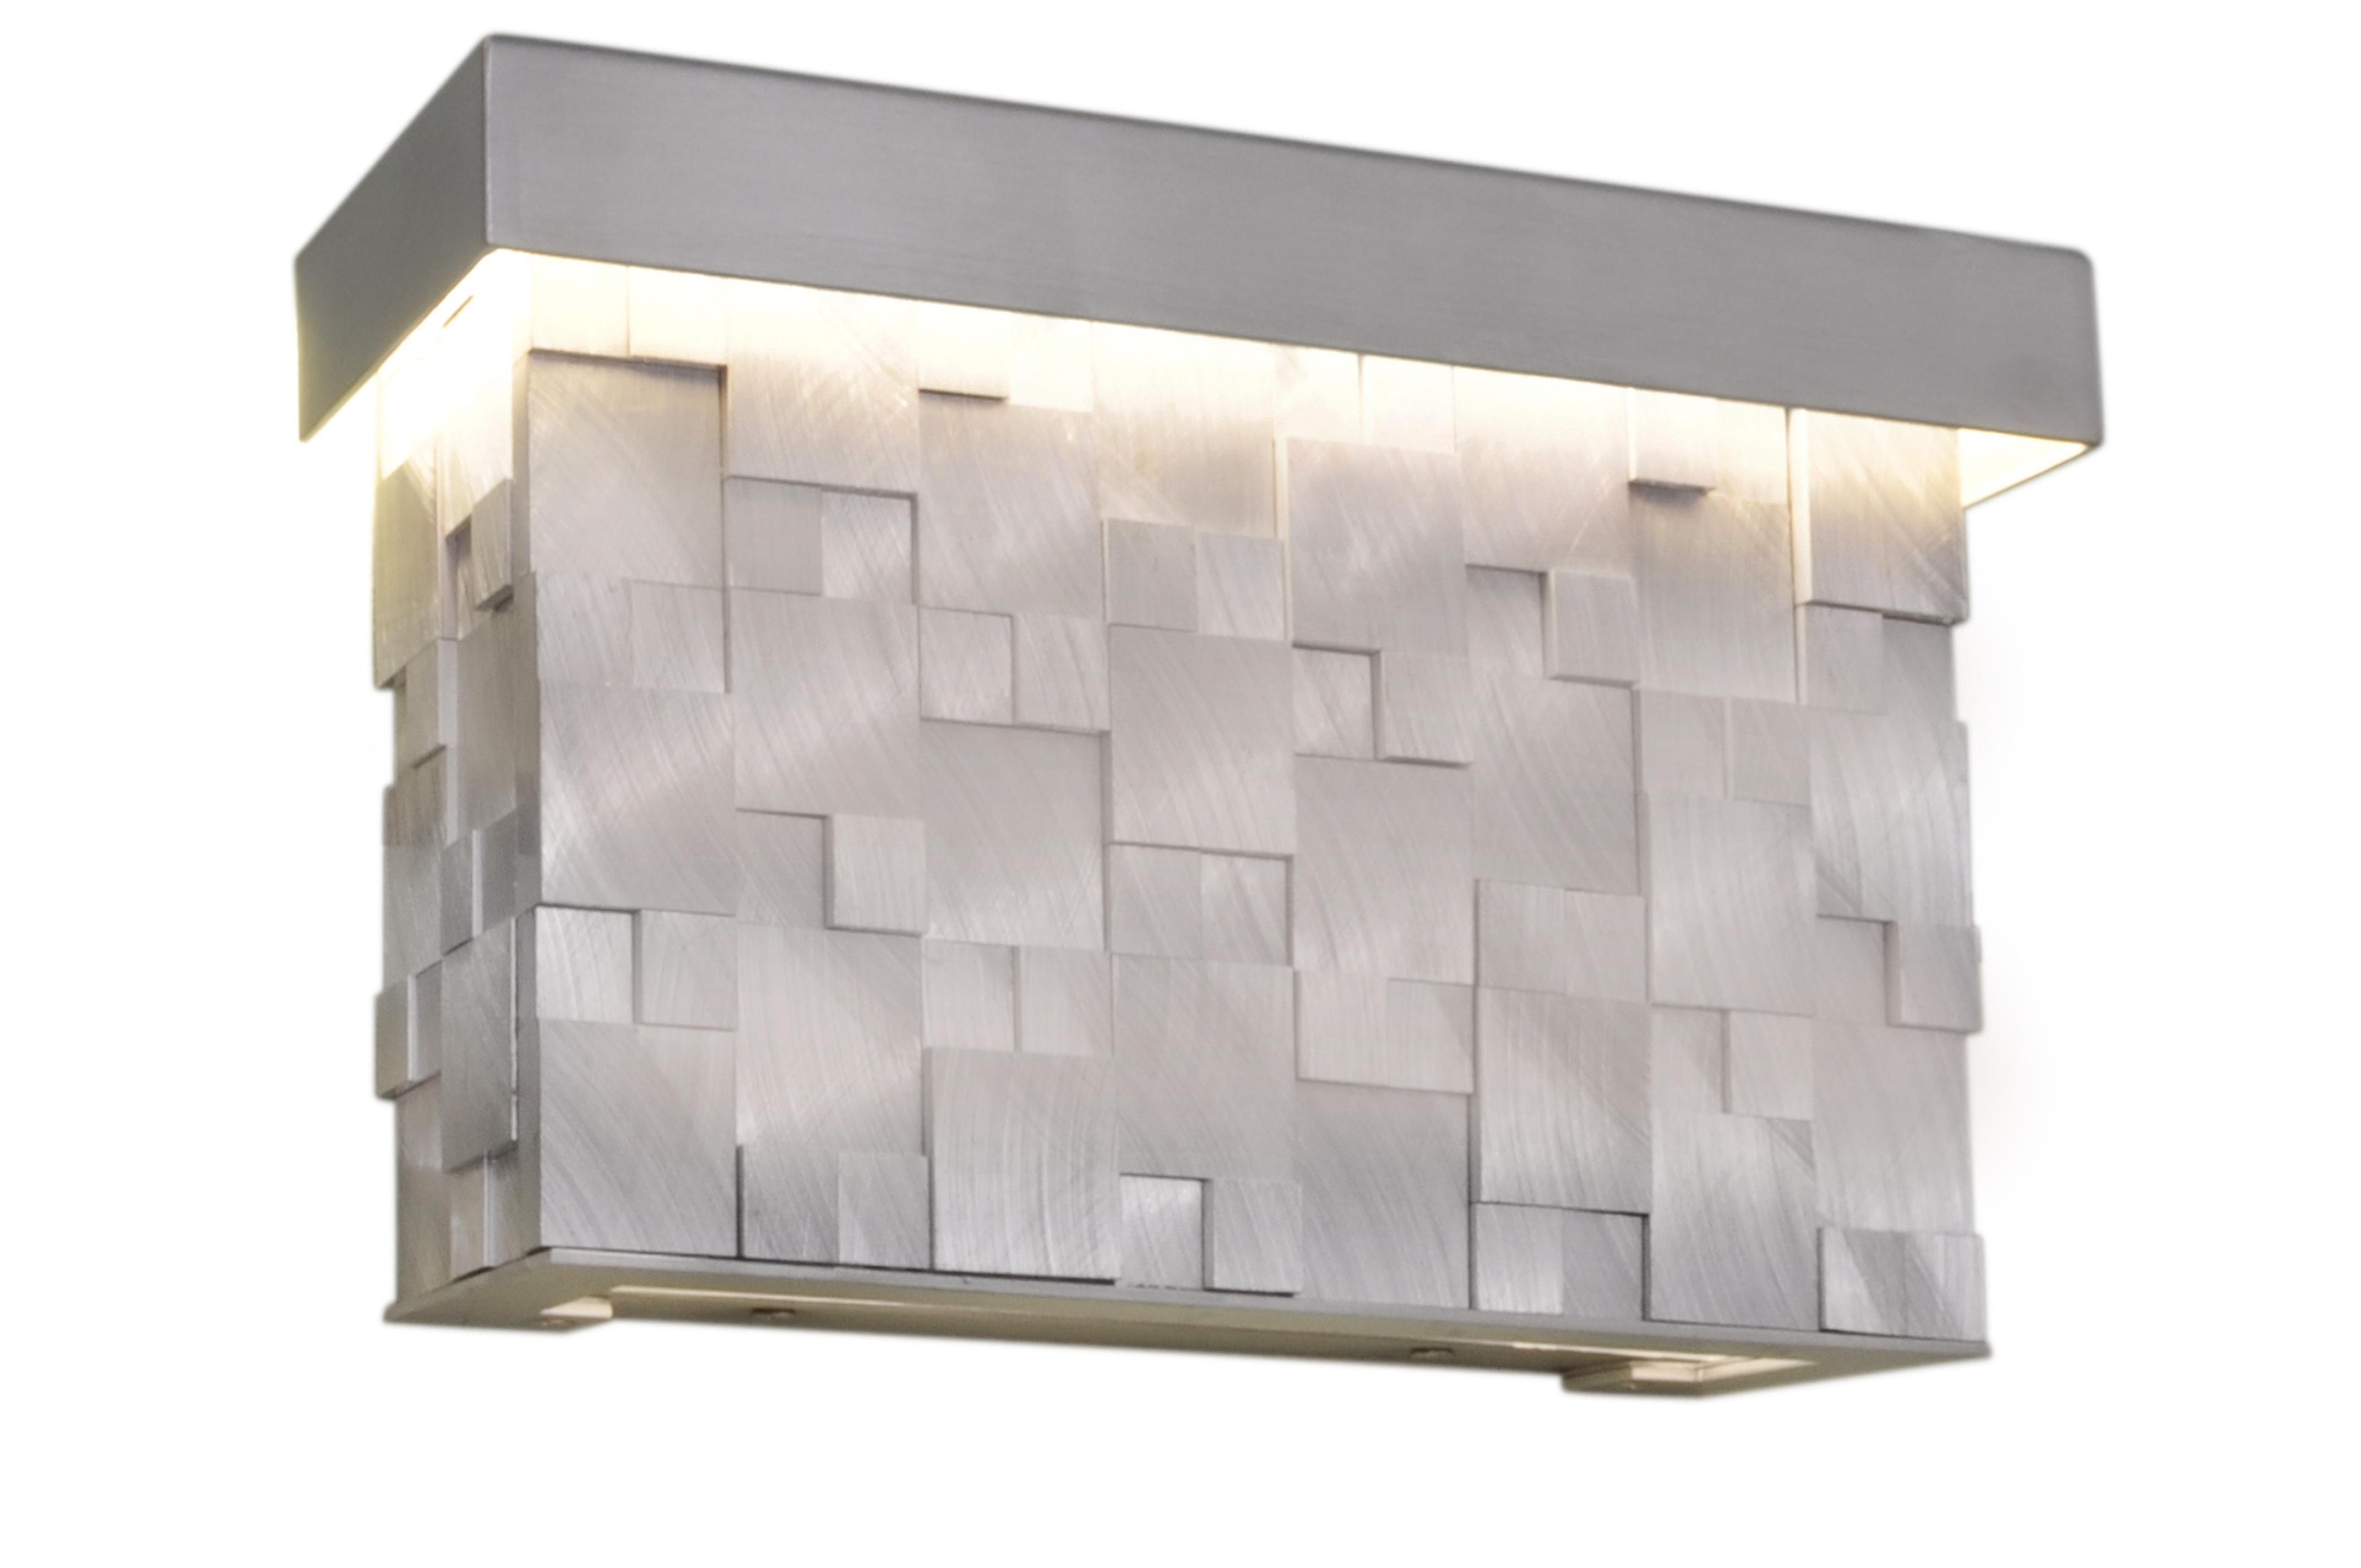 Mosaic · Mosaic LED Wall Sconce